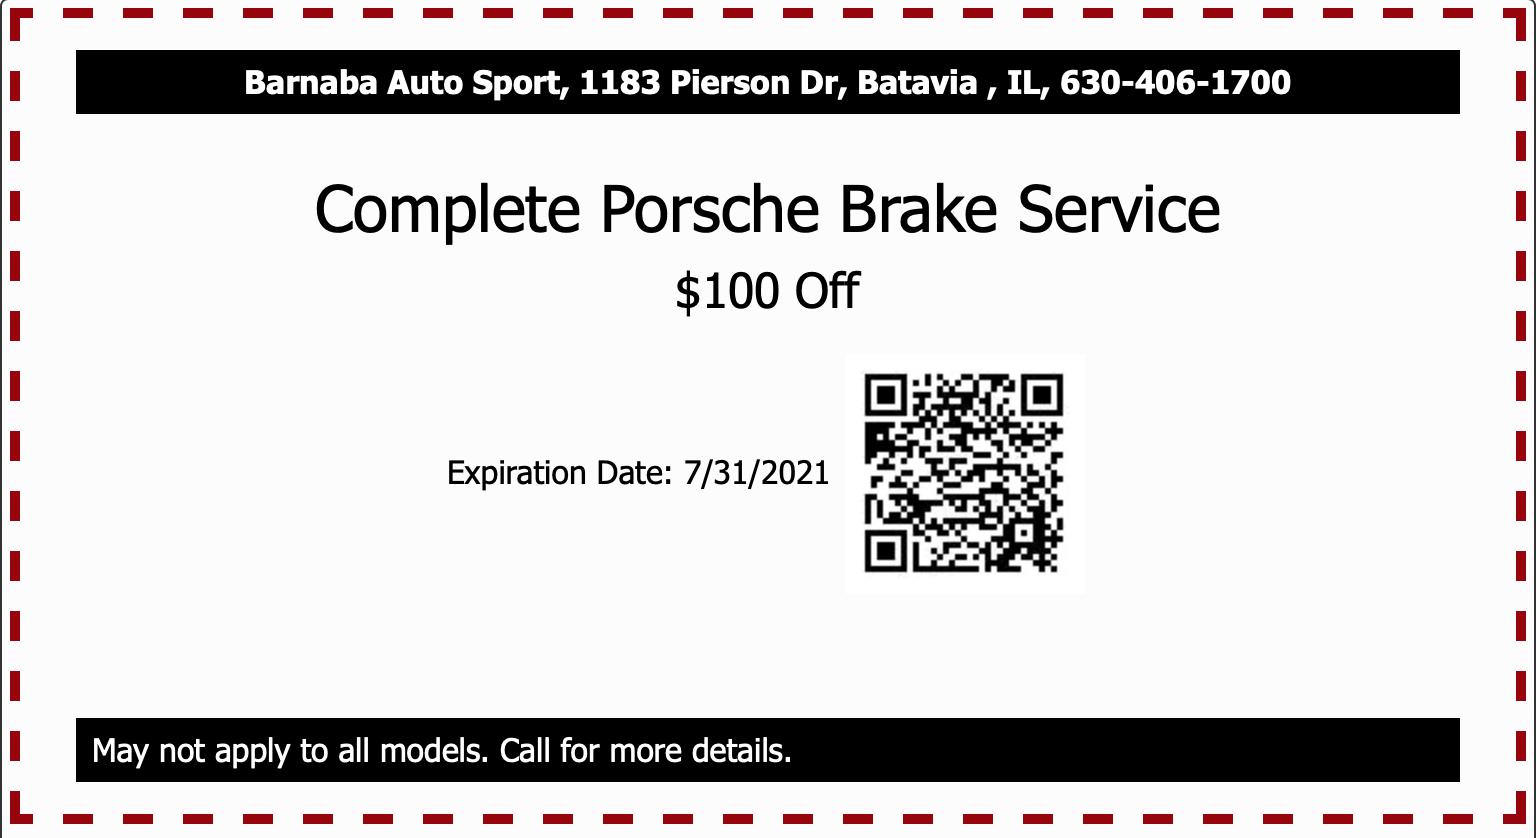 Complete Porsche Brake Service